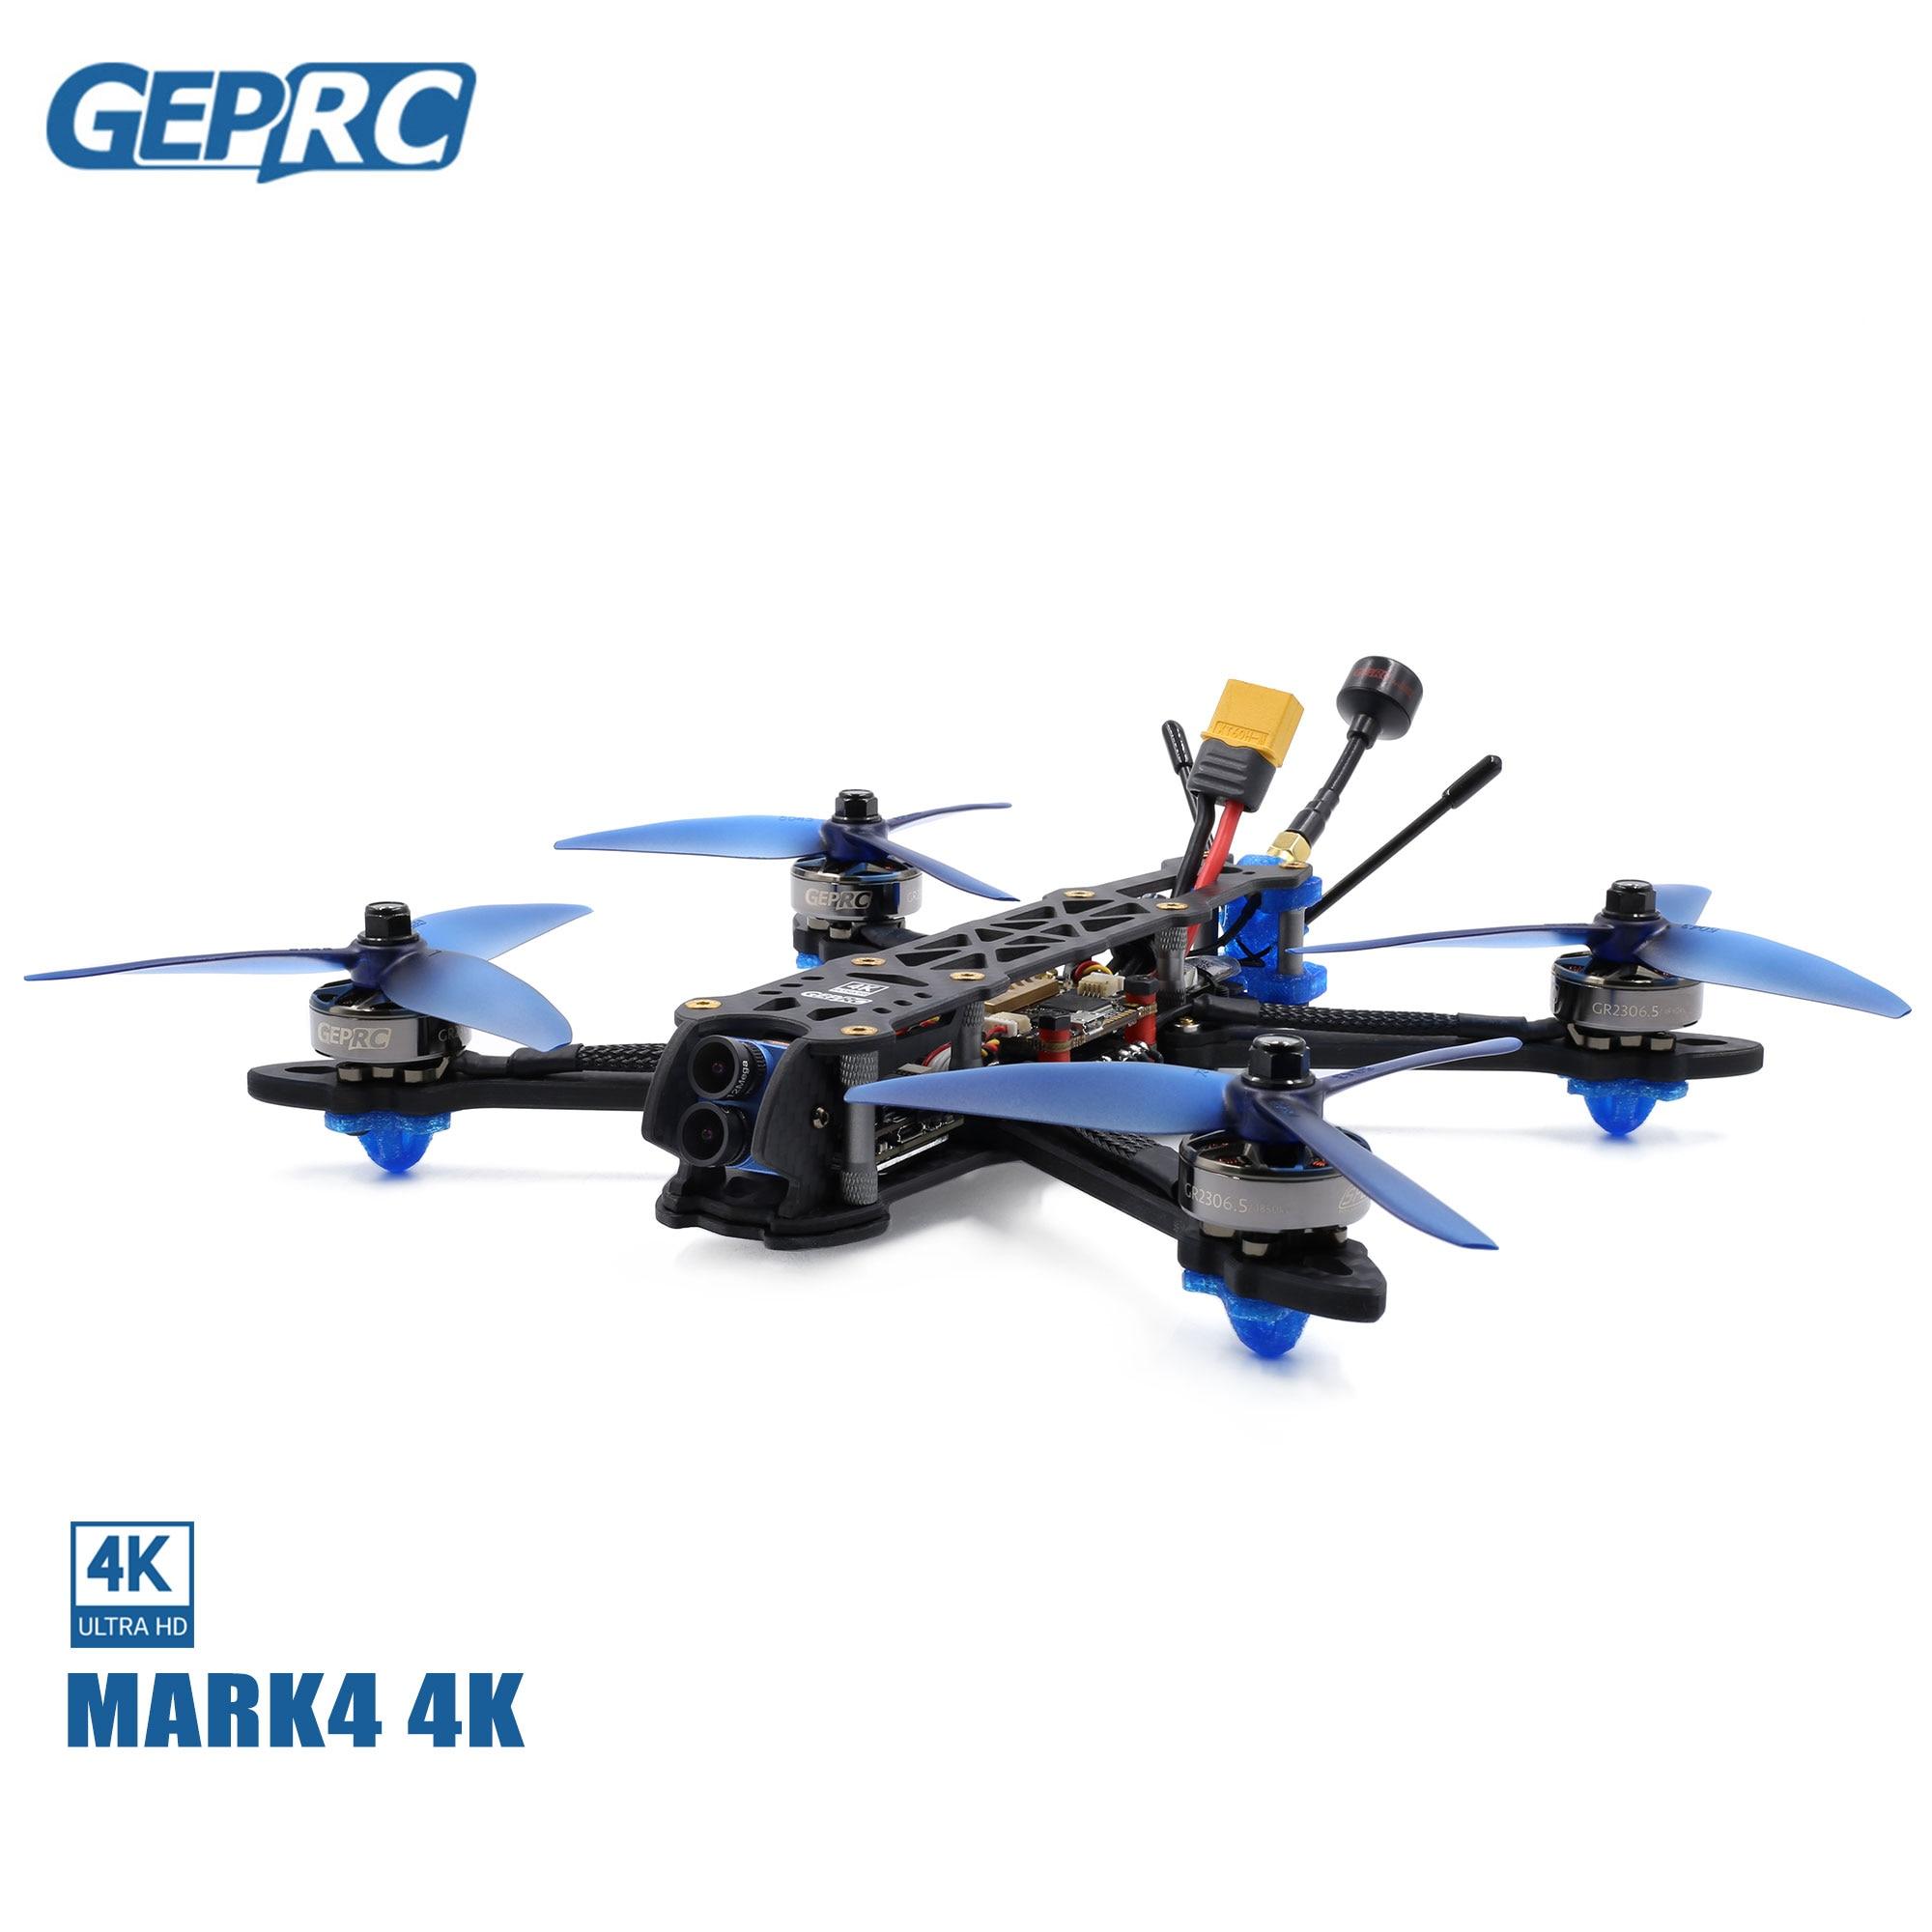 GEPRC MARK4 4K Tarsier V2 4-6S FPV Drone BNF GR2306.5 224mm FPV Freestyle Frame With SPAN-F722-VTX For FPV RC Drone